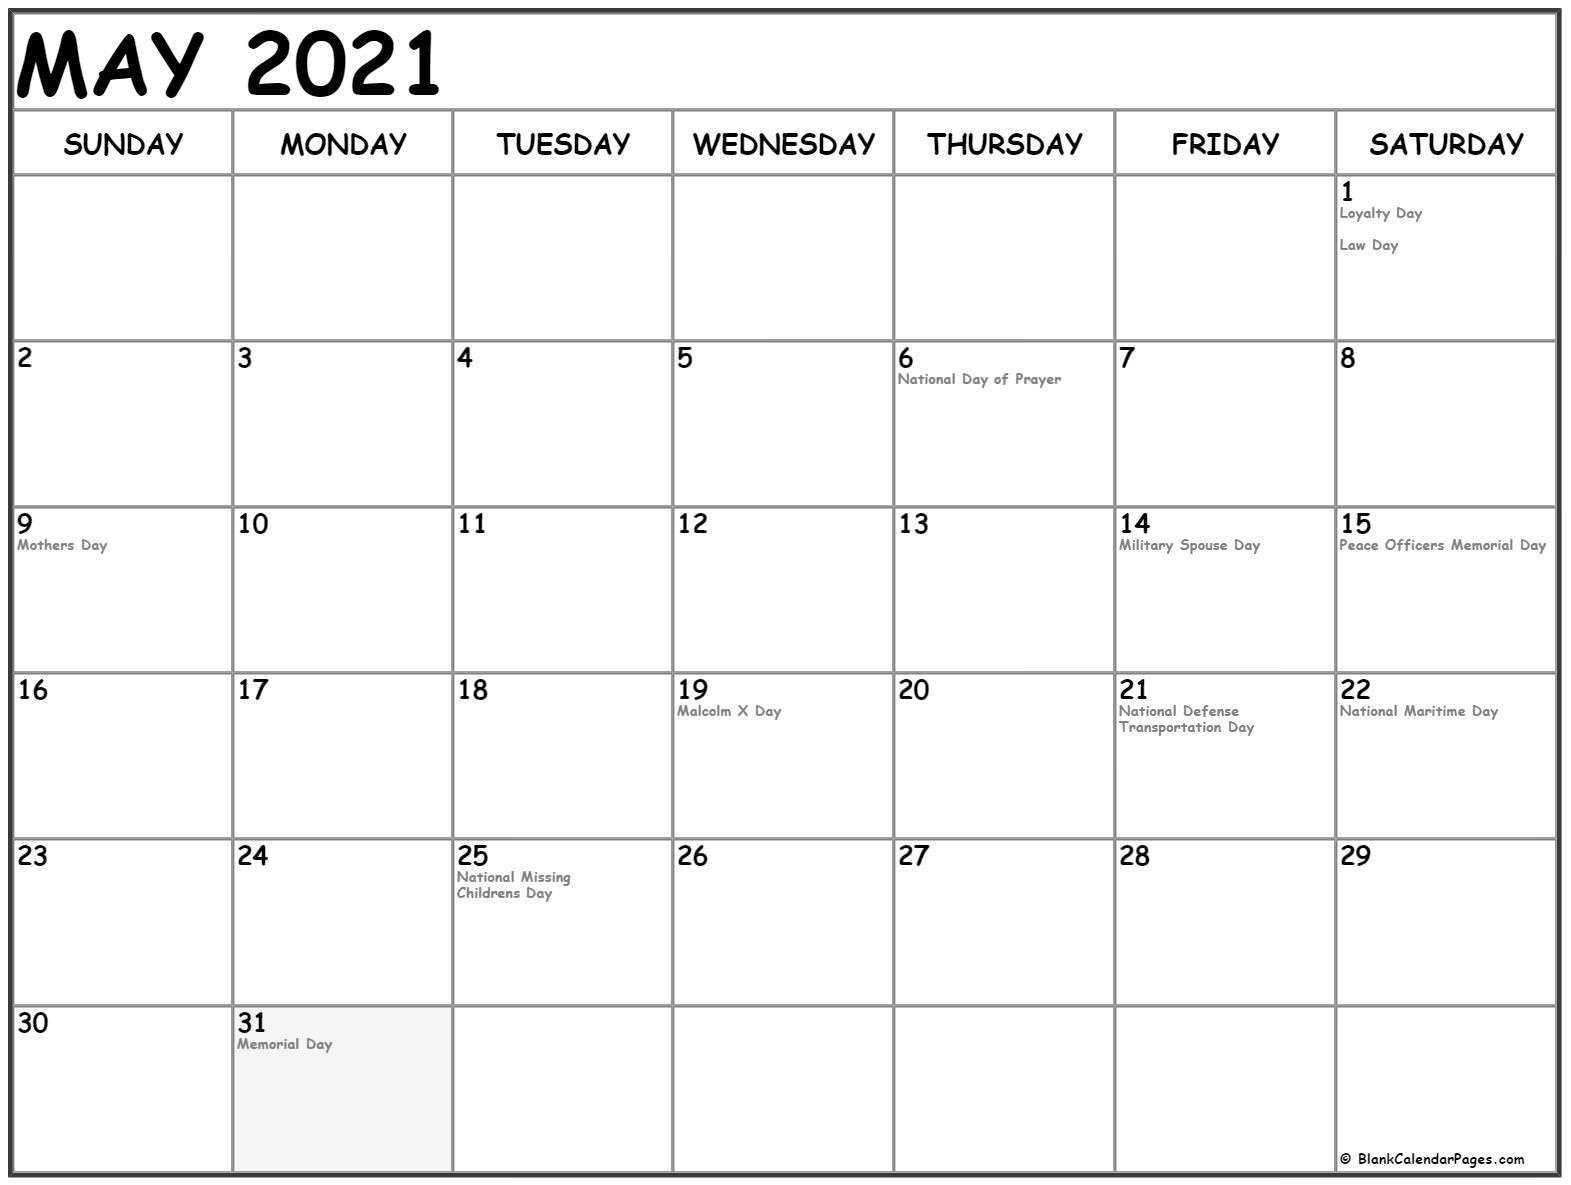 May 2021 Calendar | 51+ Calendar Templates Of 2021 Calendars